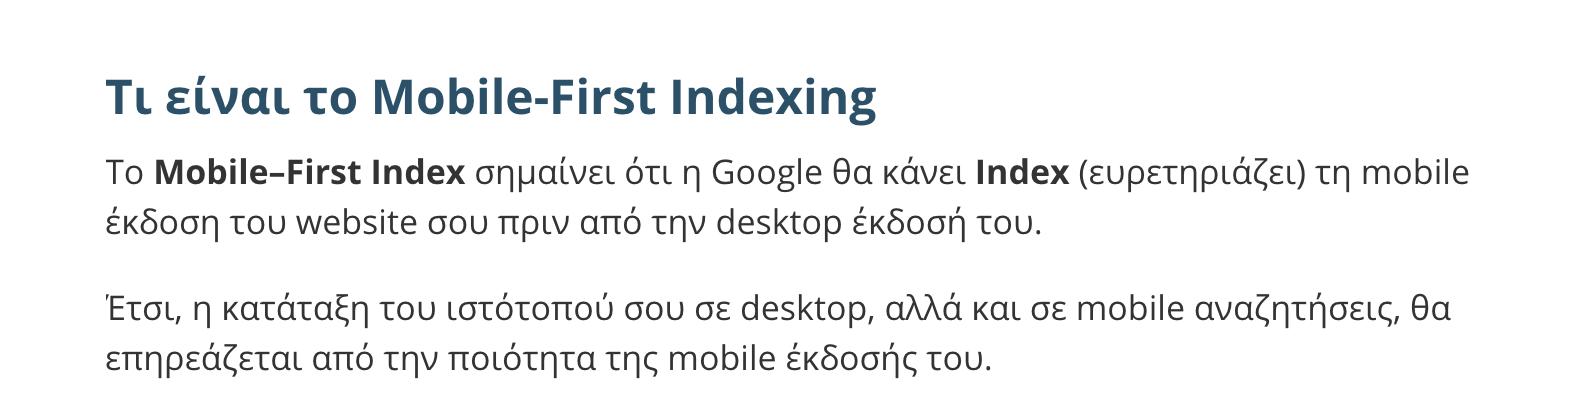 "H2 Tag ""Τι είναι το Mobile-First Indexing"" το οποίο βρίσκεται μέσα στο άρθρο ""Τι Είναι το Mobile-First Indexing και Πώς να Προετοιμαστείς"""